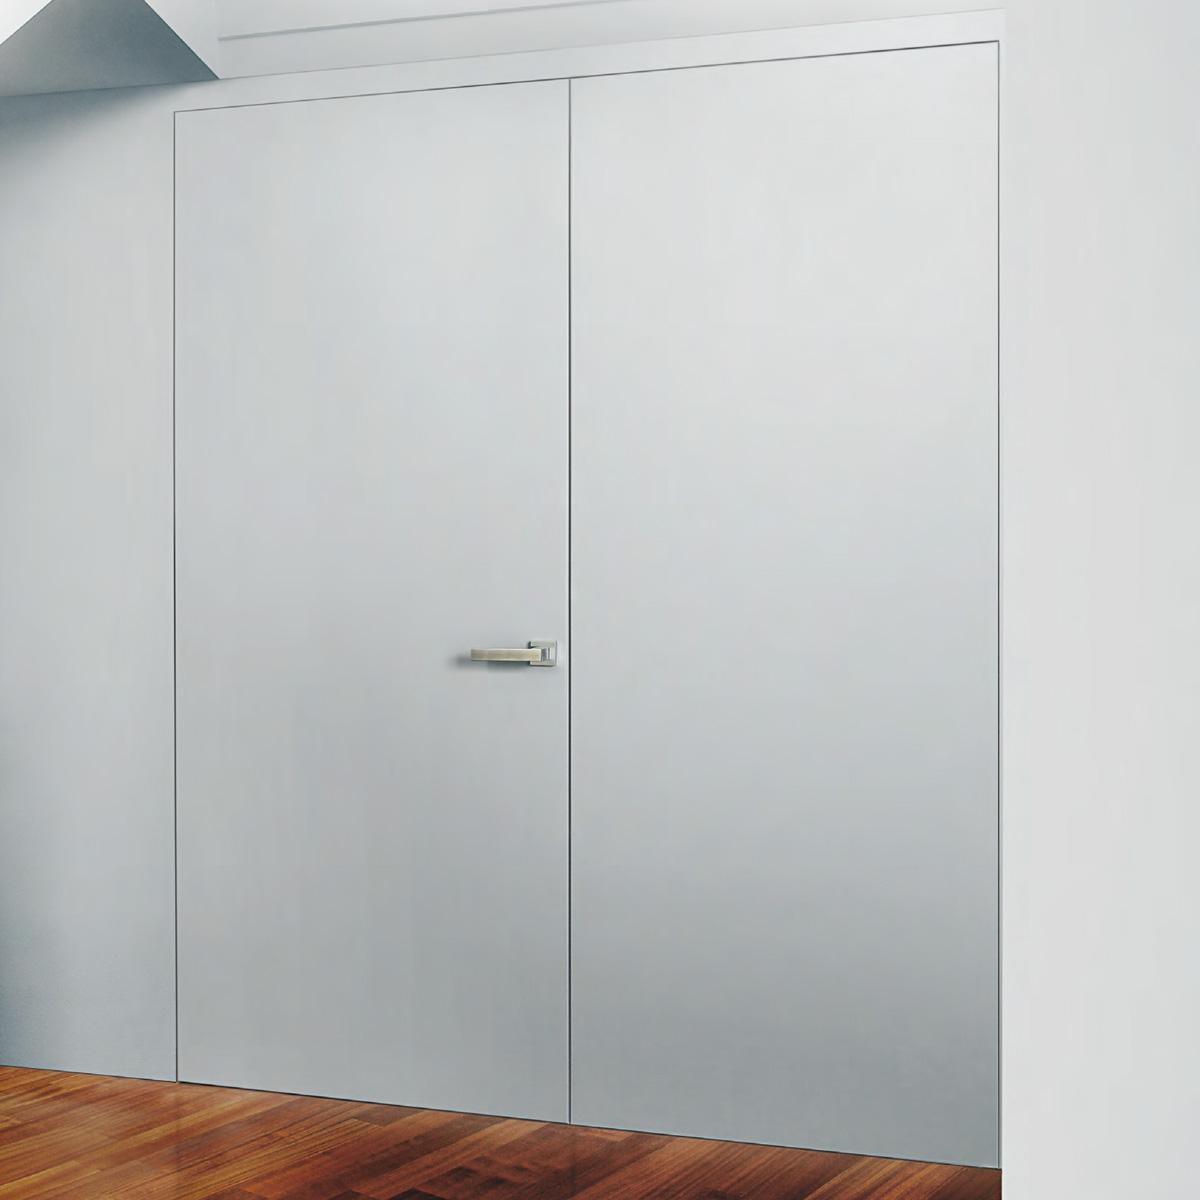 Porta filomuro Dierre Mimesi, minimal ed elegante | Fabbroni serramenti